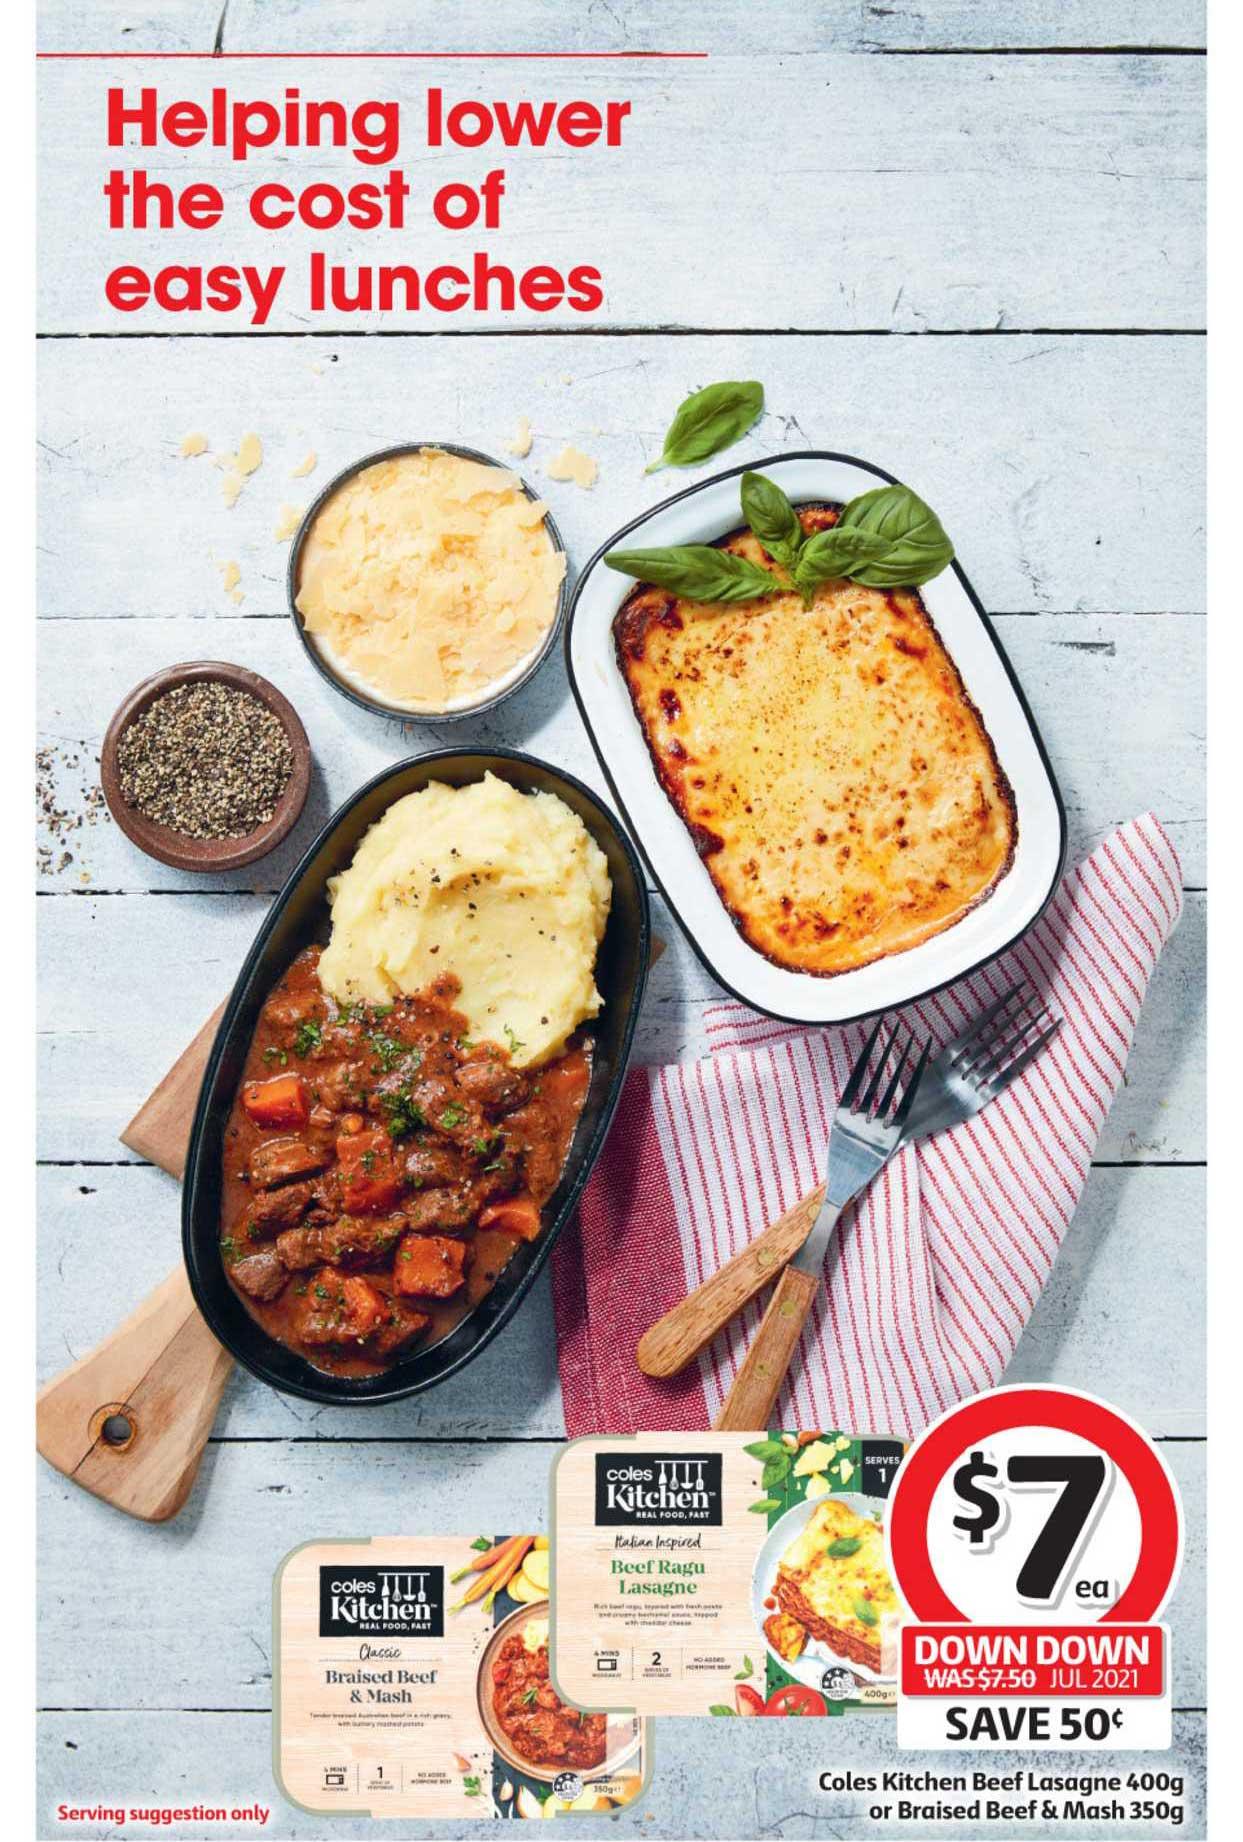 Coles Coles Kitchen Beef Lasagne 400g Or Braised Beef & Mash 350g